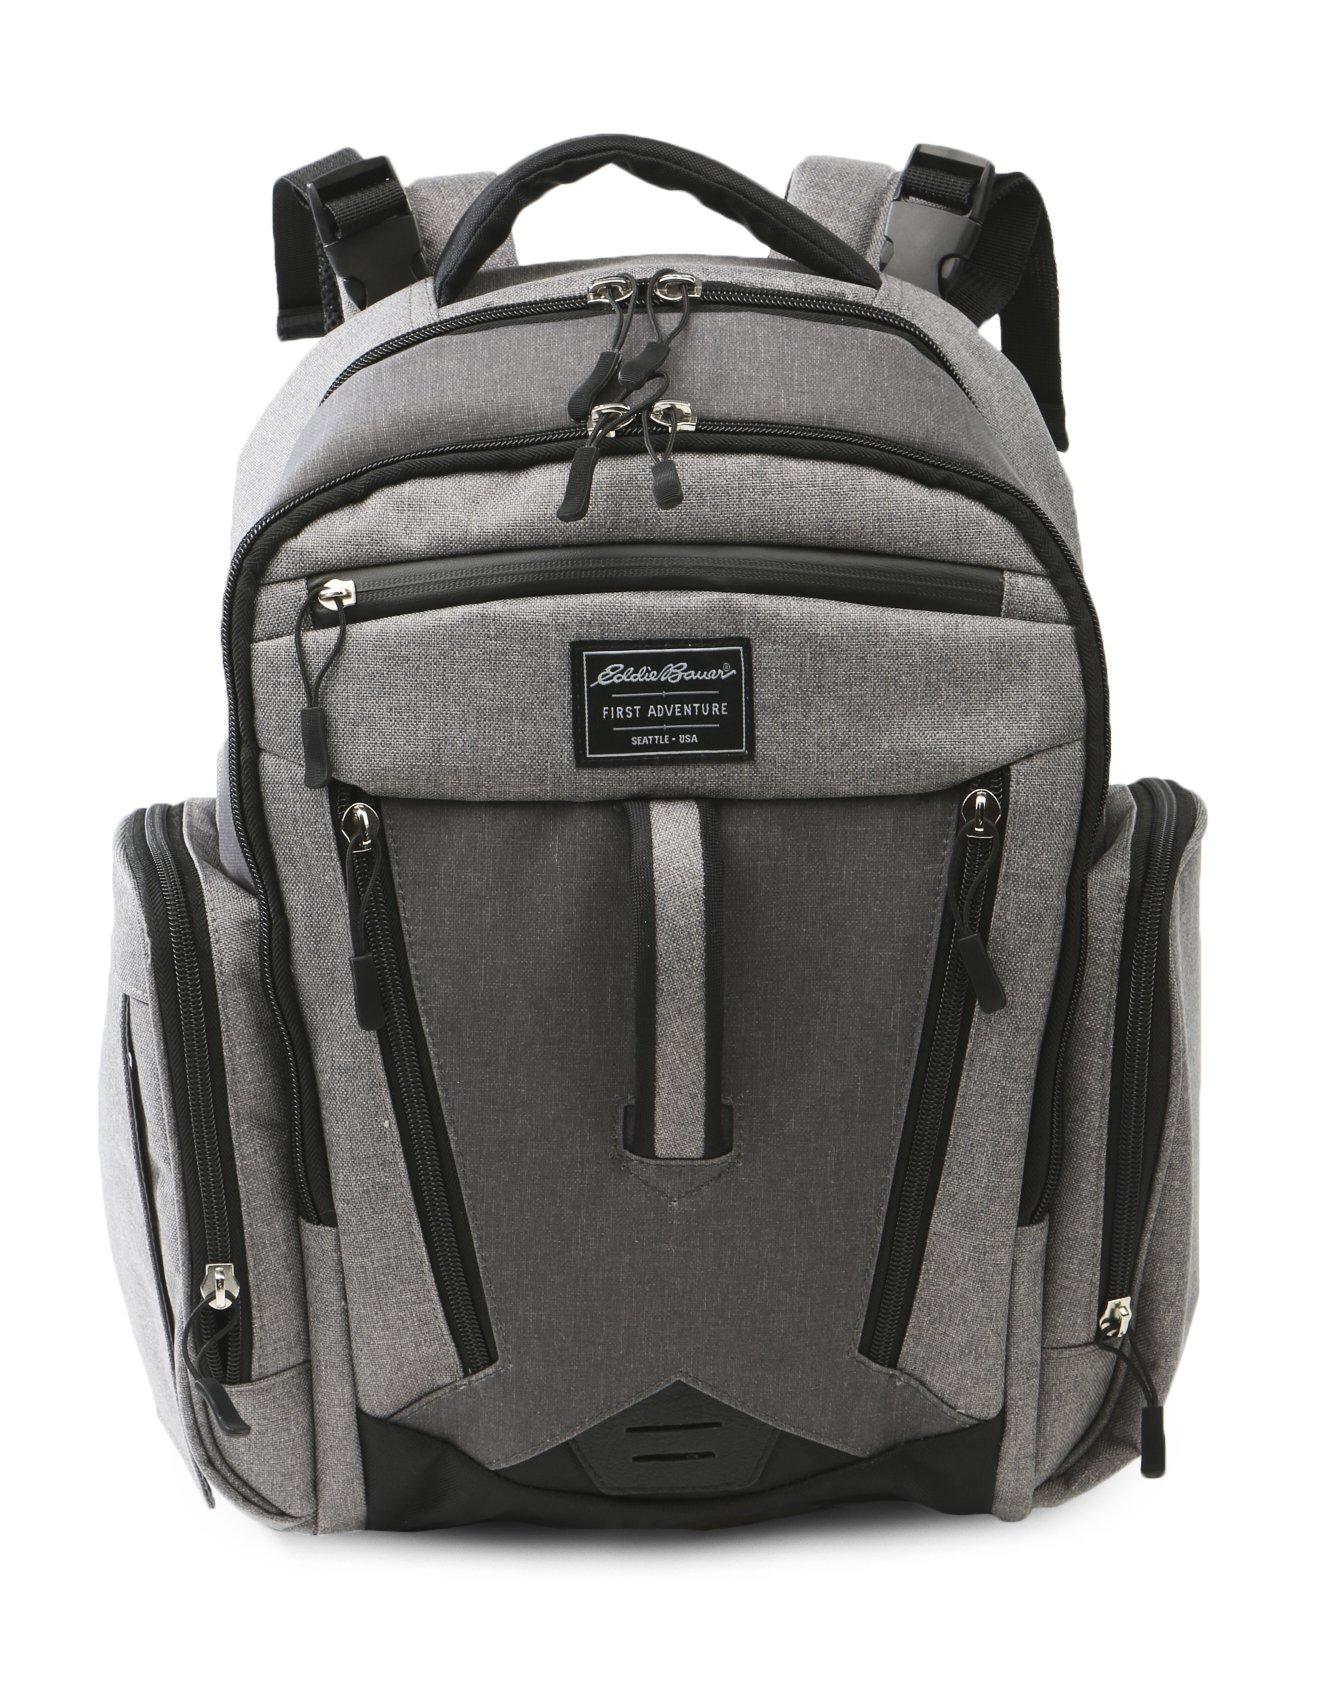 97b5cf1415 Get Quotations · Eddie Bauer Back Pack Diaper Bag